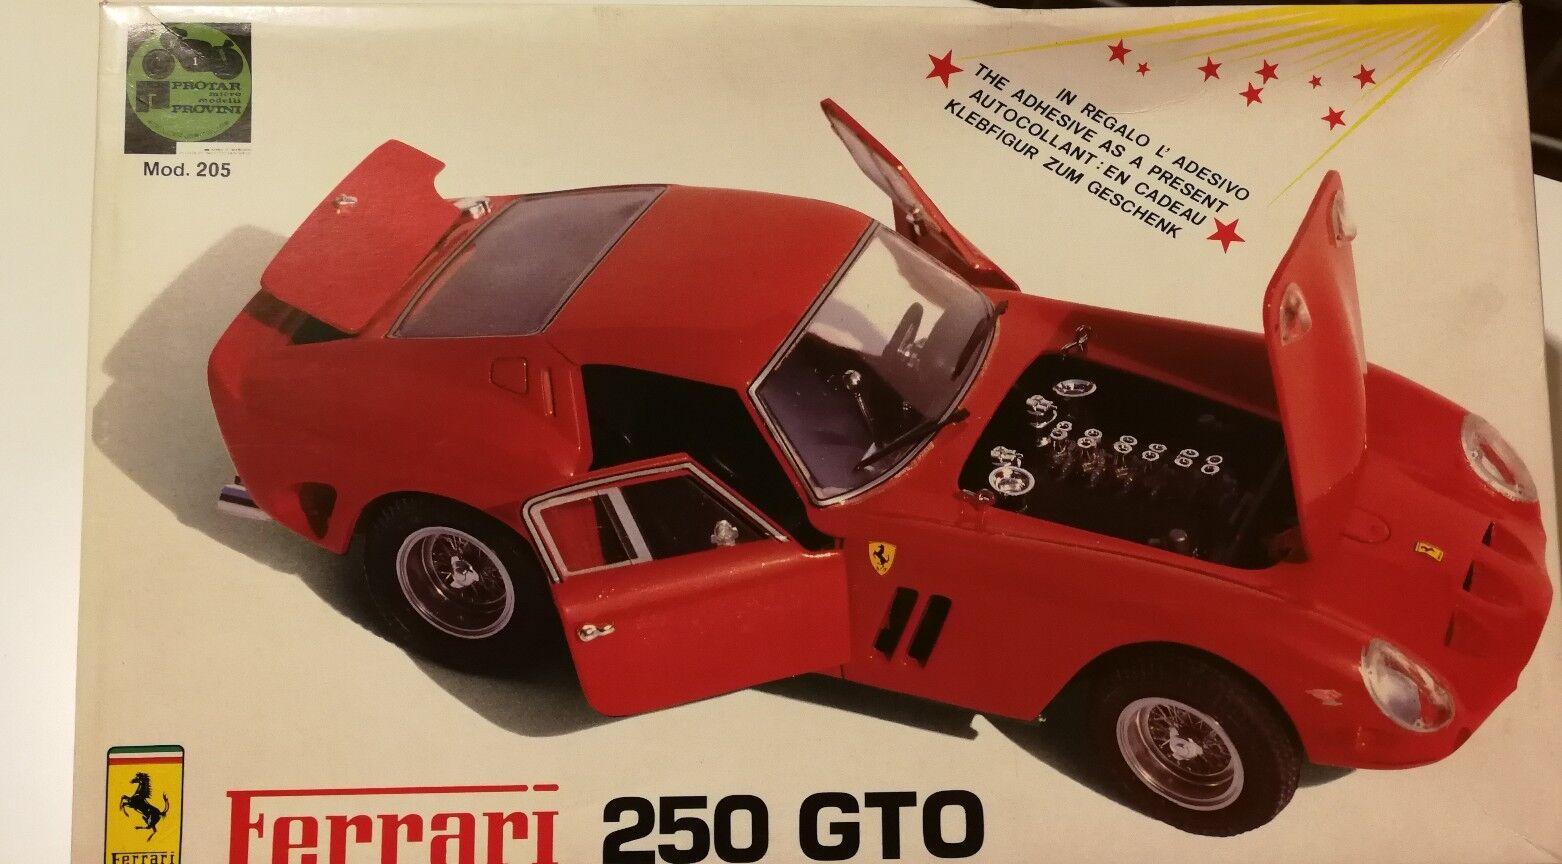 1 24 KIT--FERRARI 250 GTO --- ProugeAR (REF  205) + DECALS